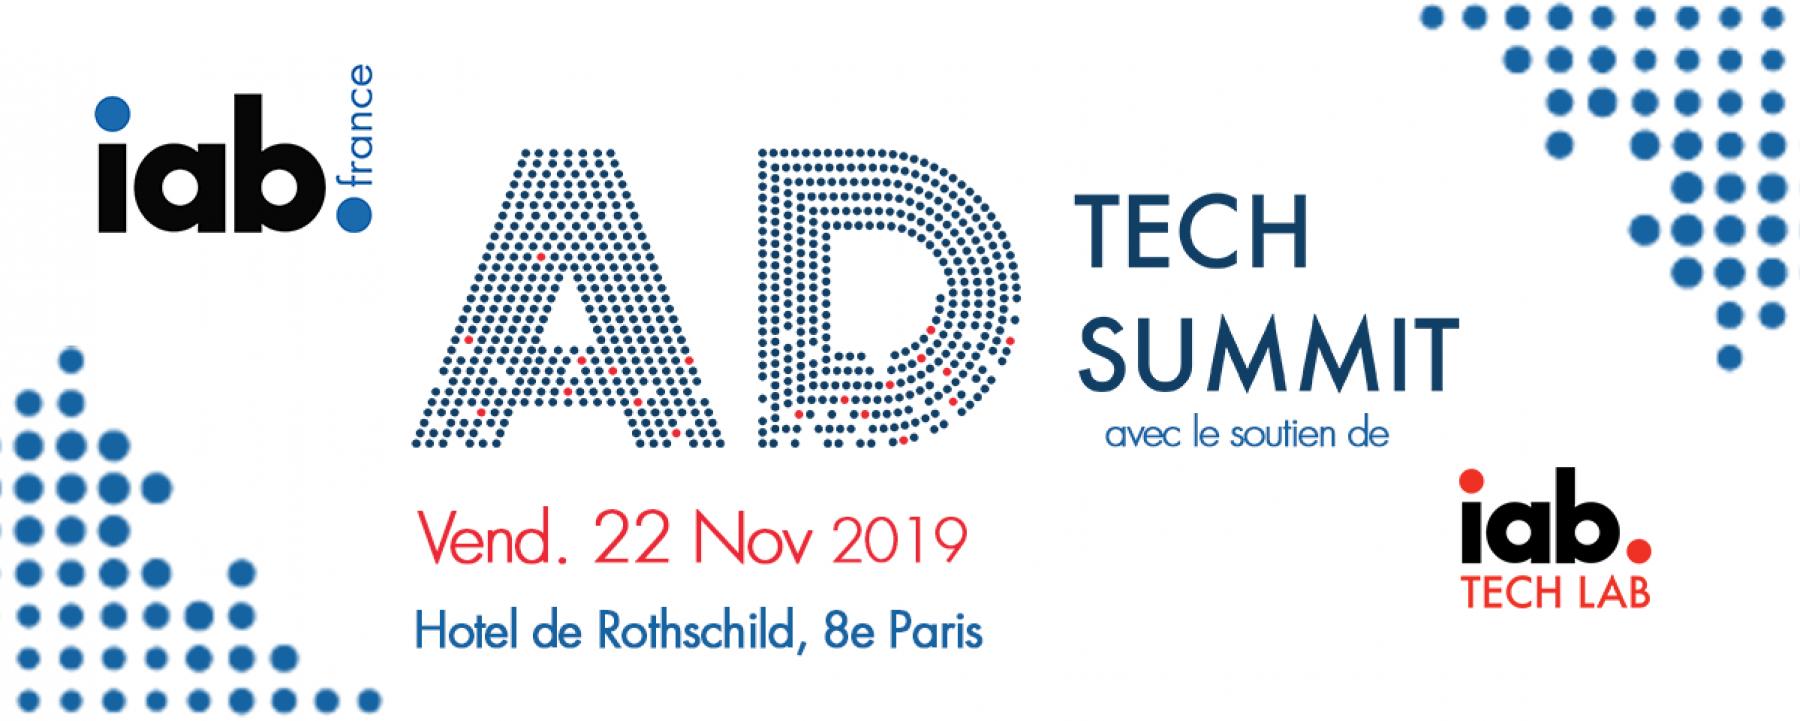 Adomik_Event_iab_France_tech_summit_2019